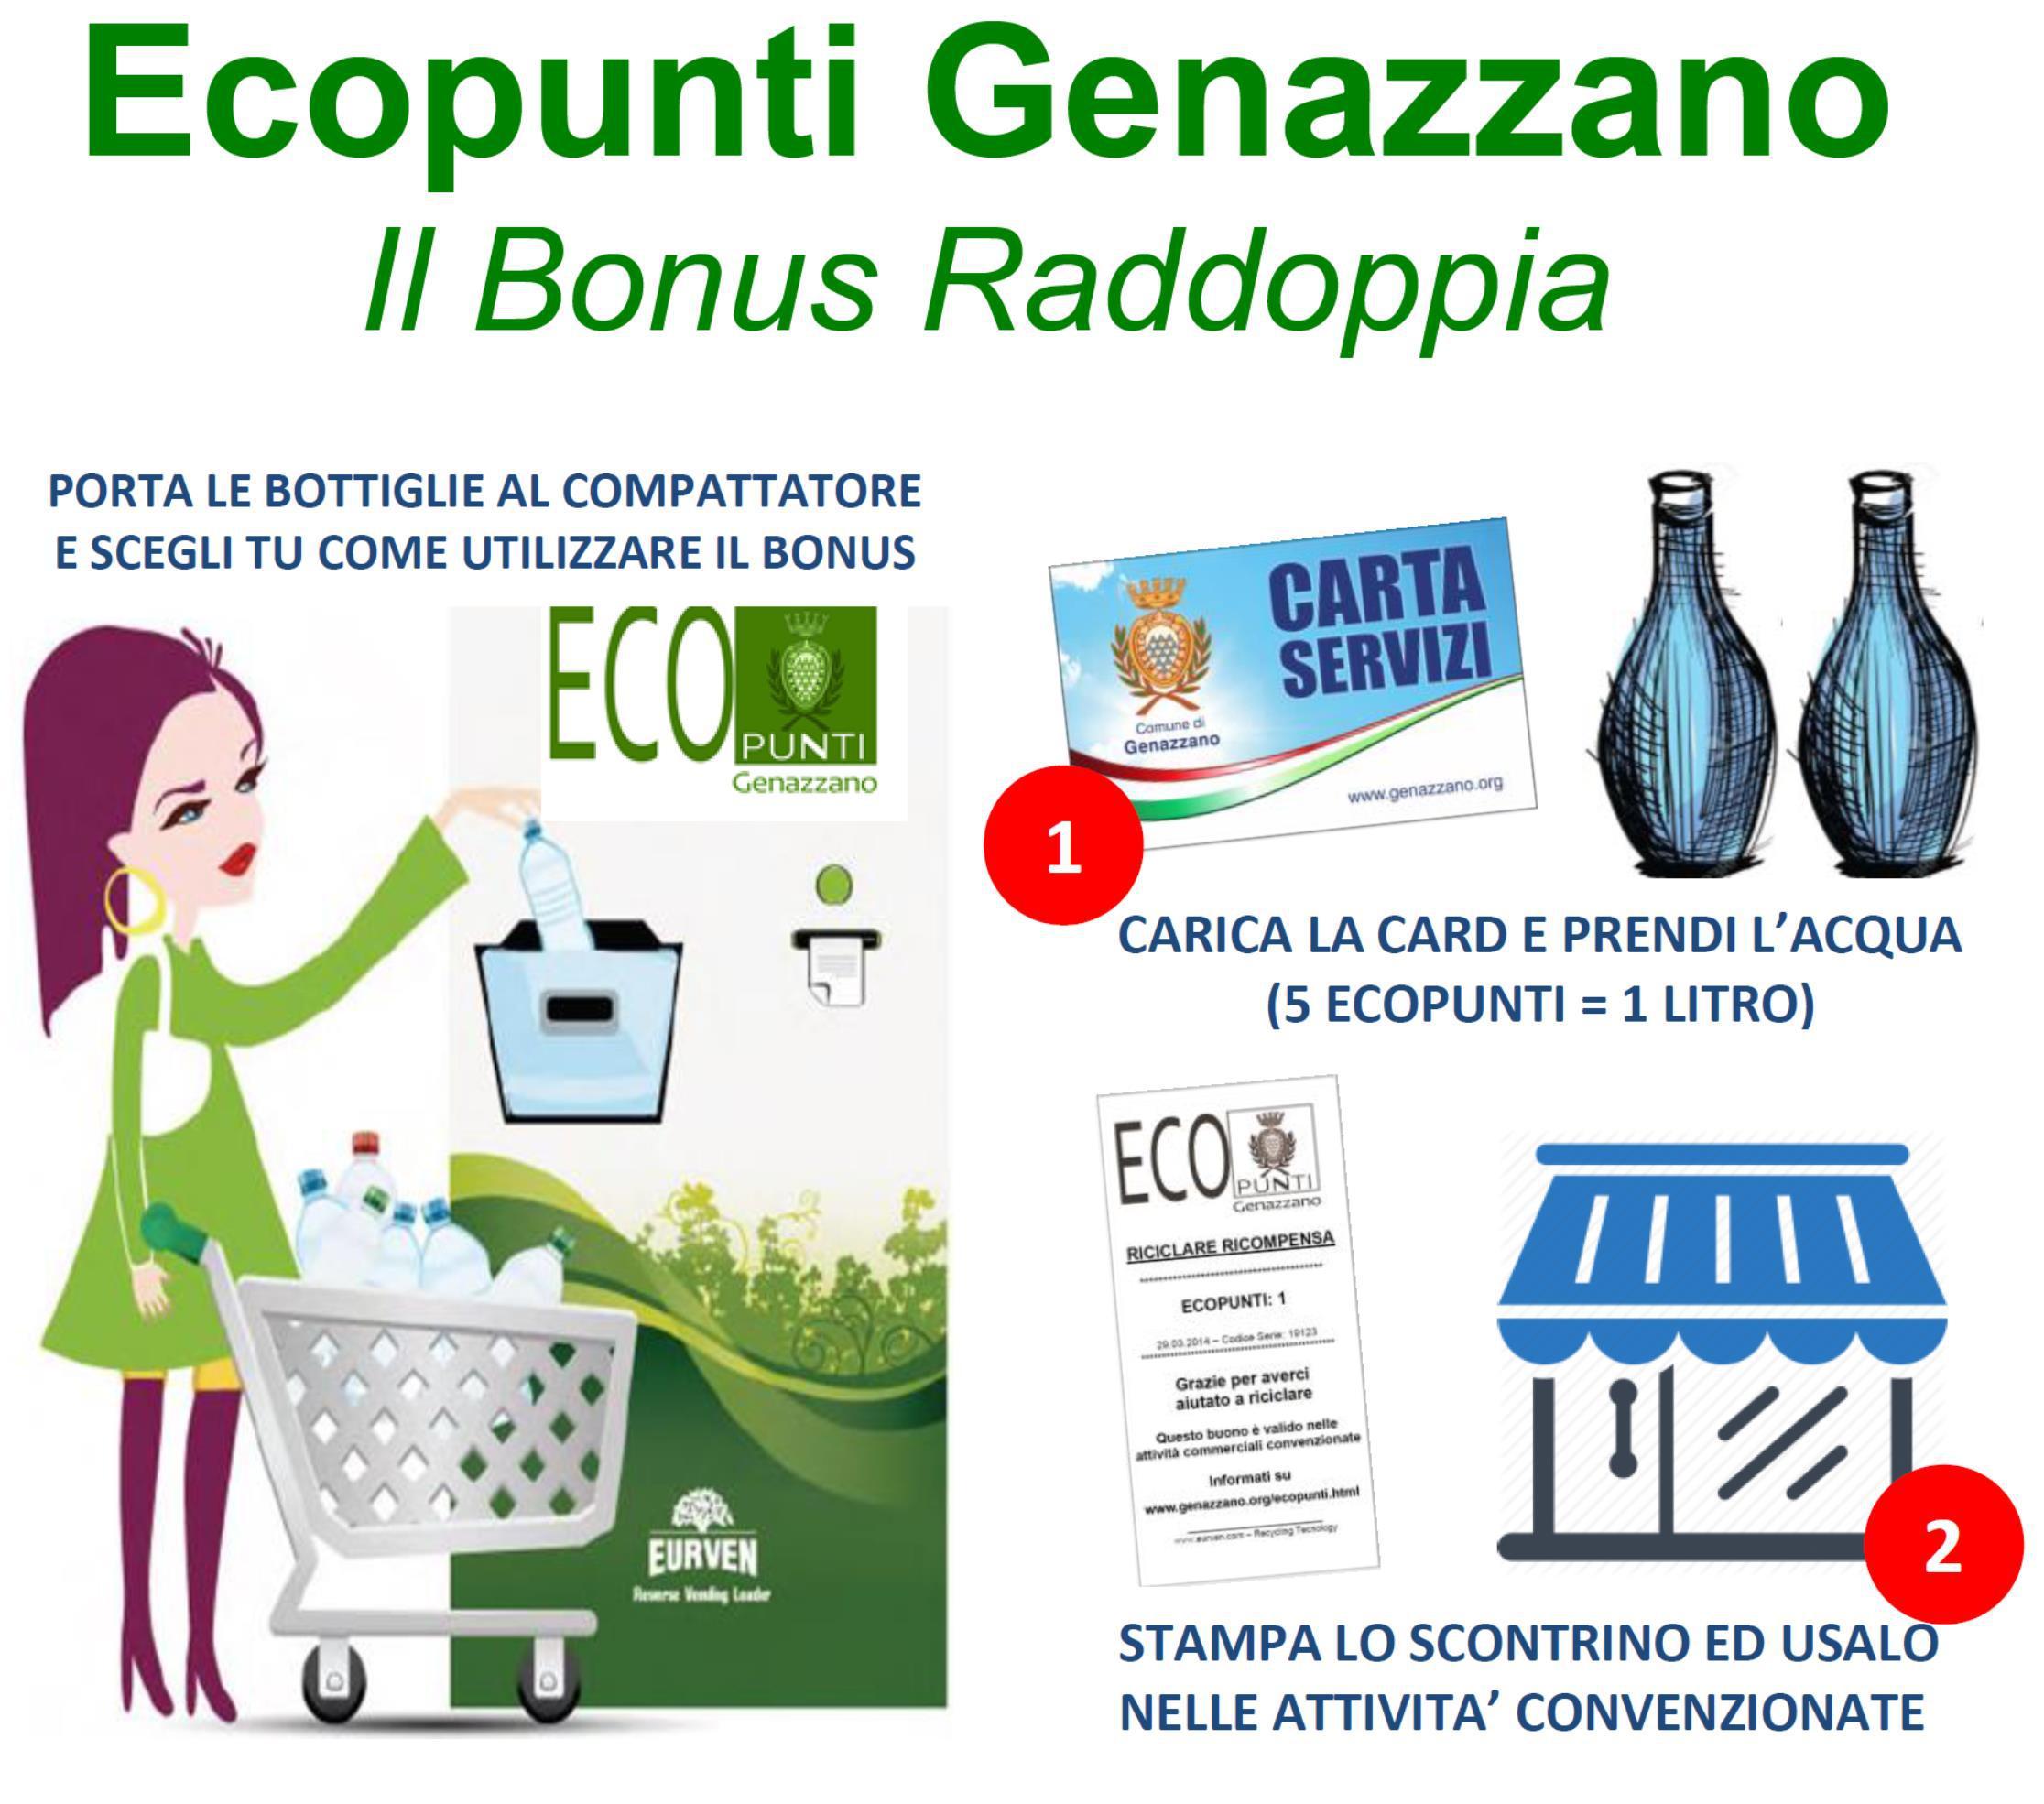 https://www.genazzano.org/immagini_pagine/03-05-2019/1556886091-91-.jpg